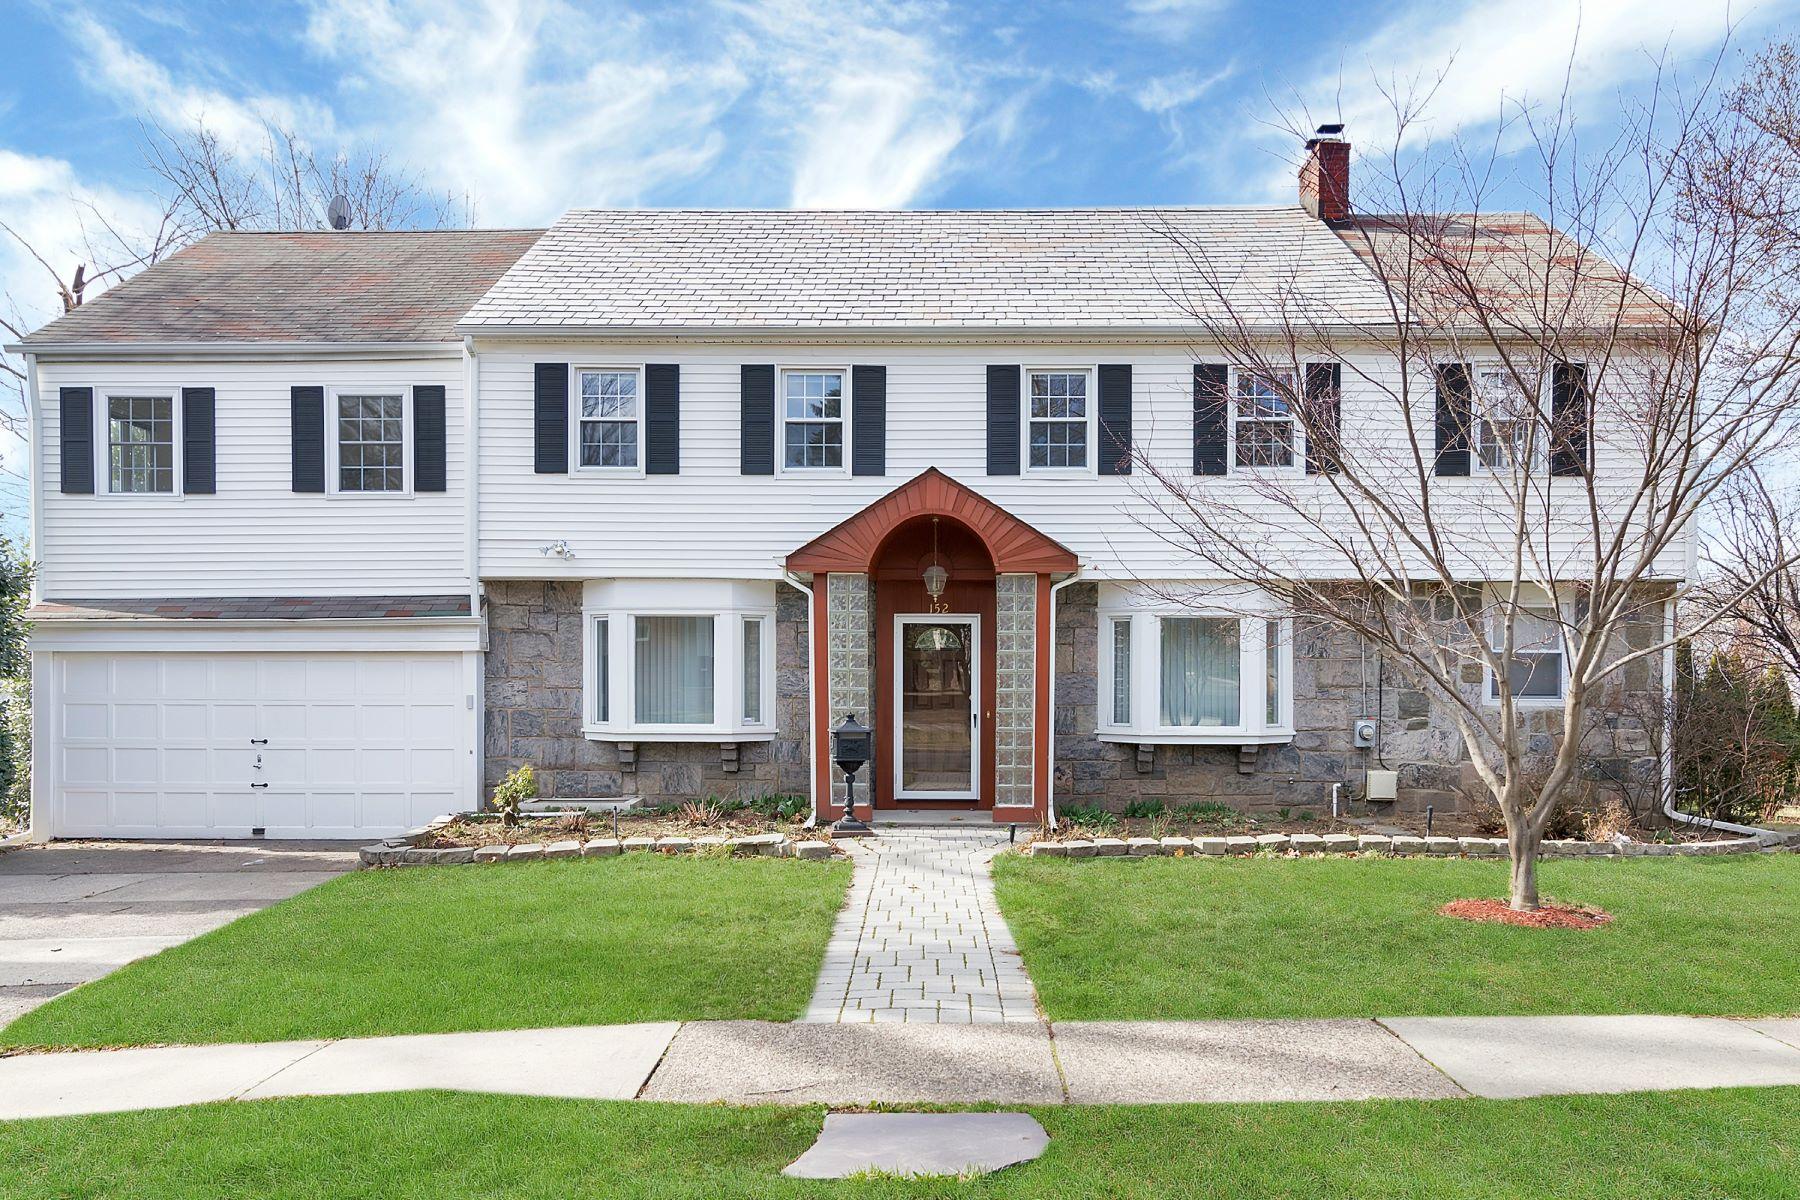 واحد منزل الأسرة للـ Sale في Welcome Home! 152 Grayson Place Teaneck, New Jersey, 07666 United States